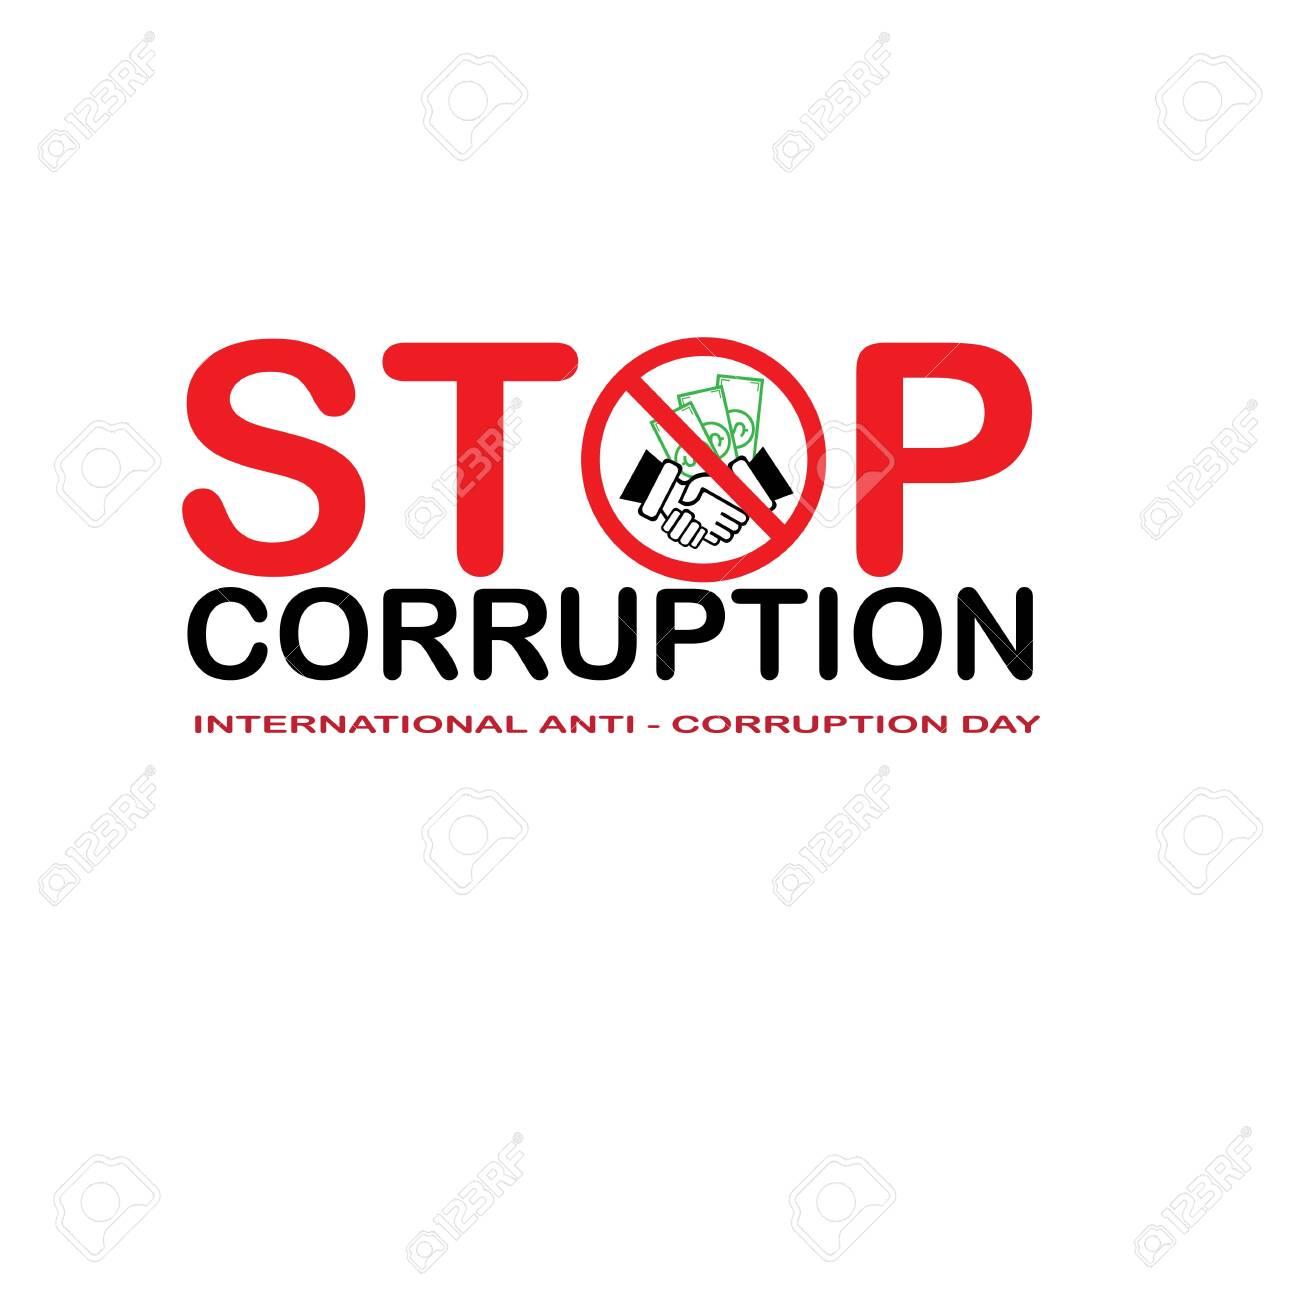 Stop Corruption and International Anti-Corruption Day - 137160138